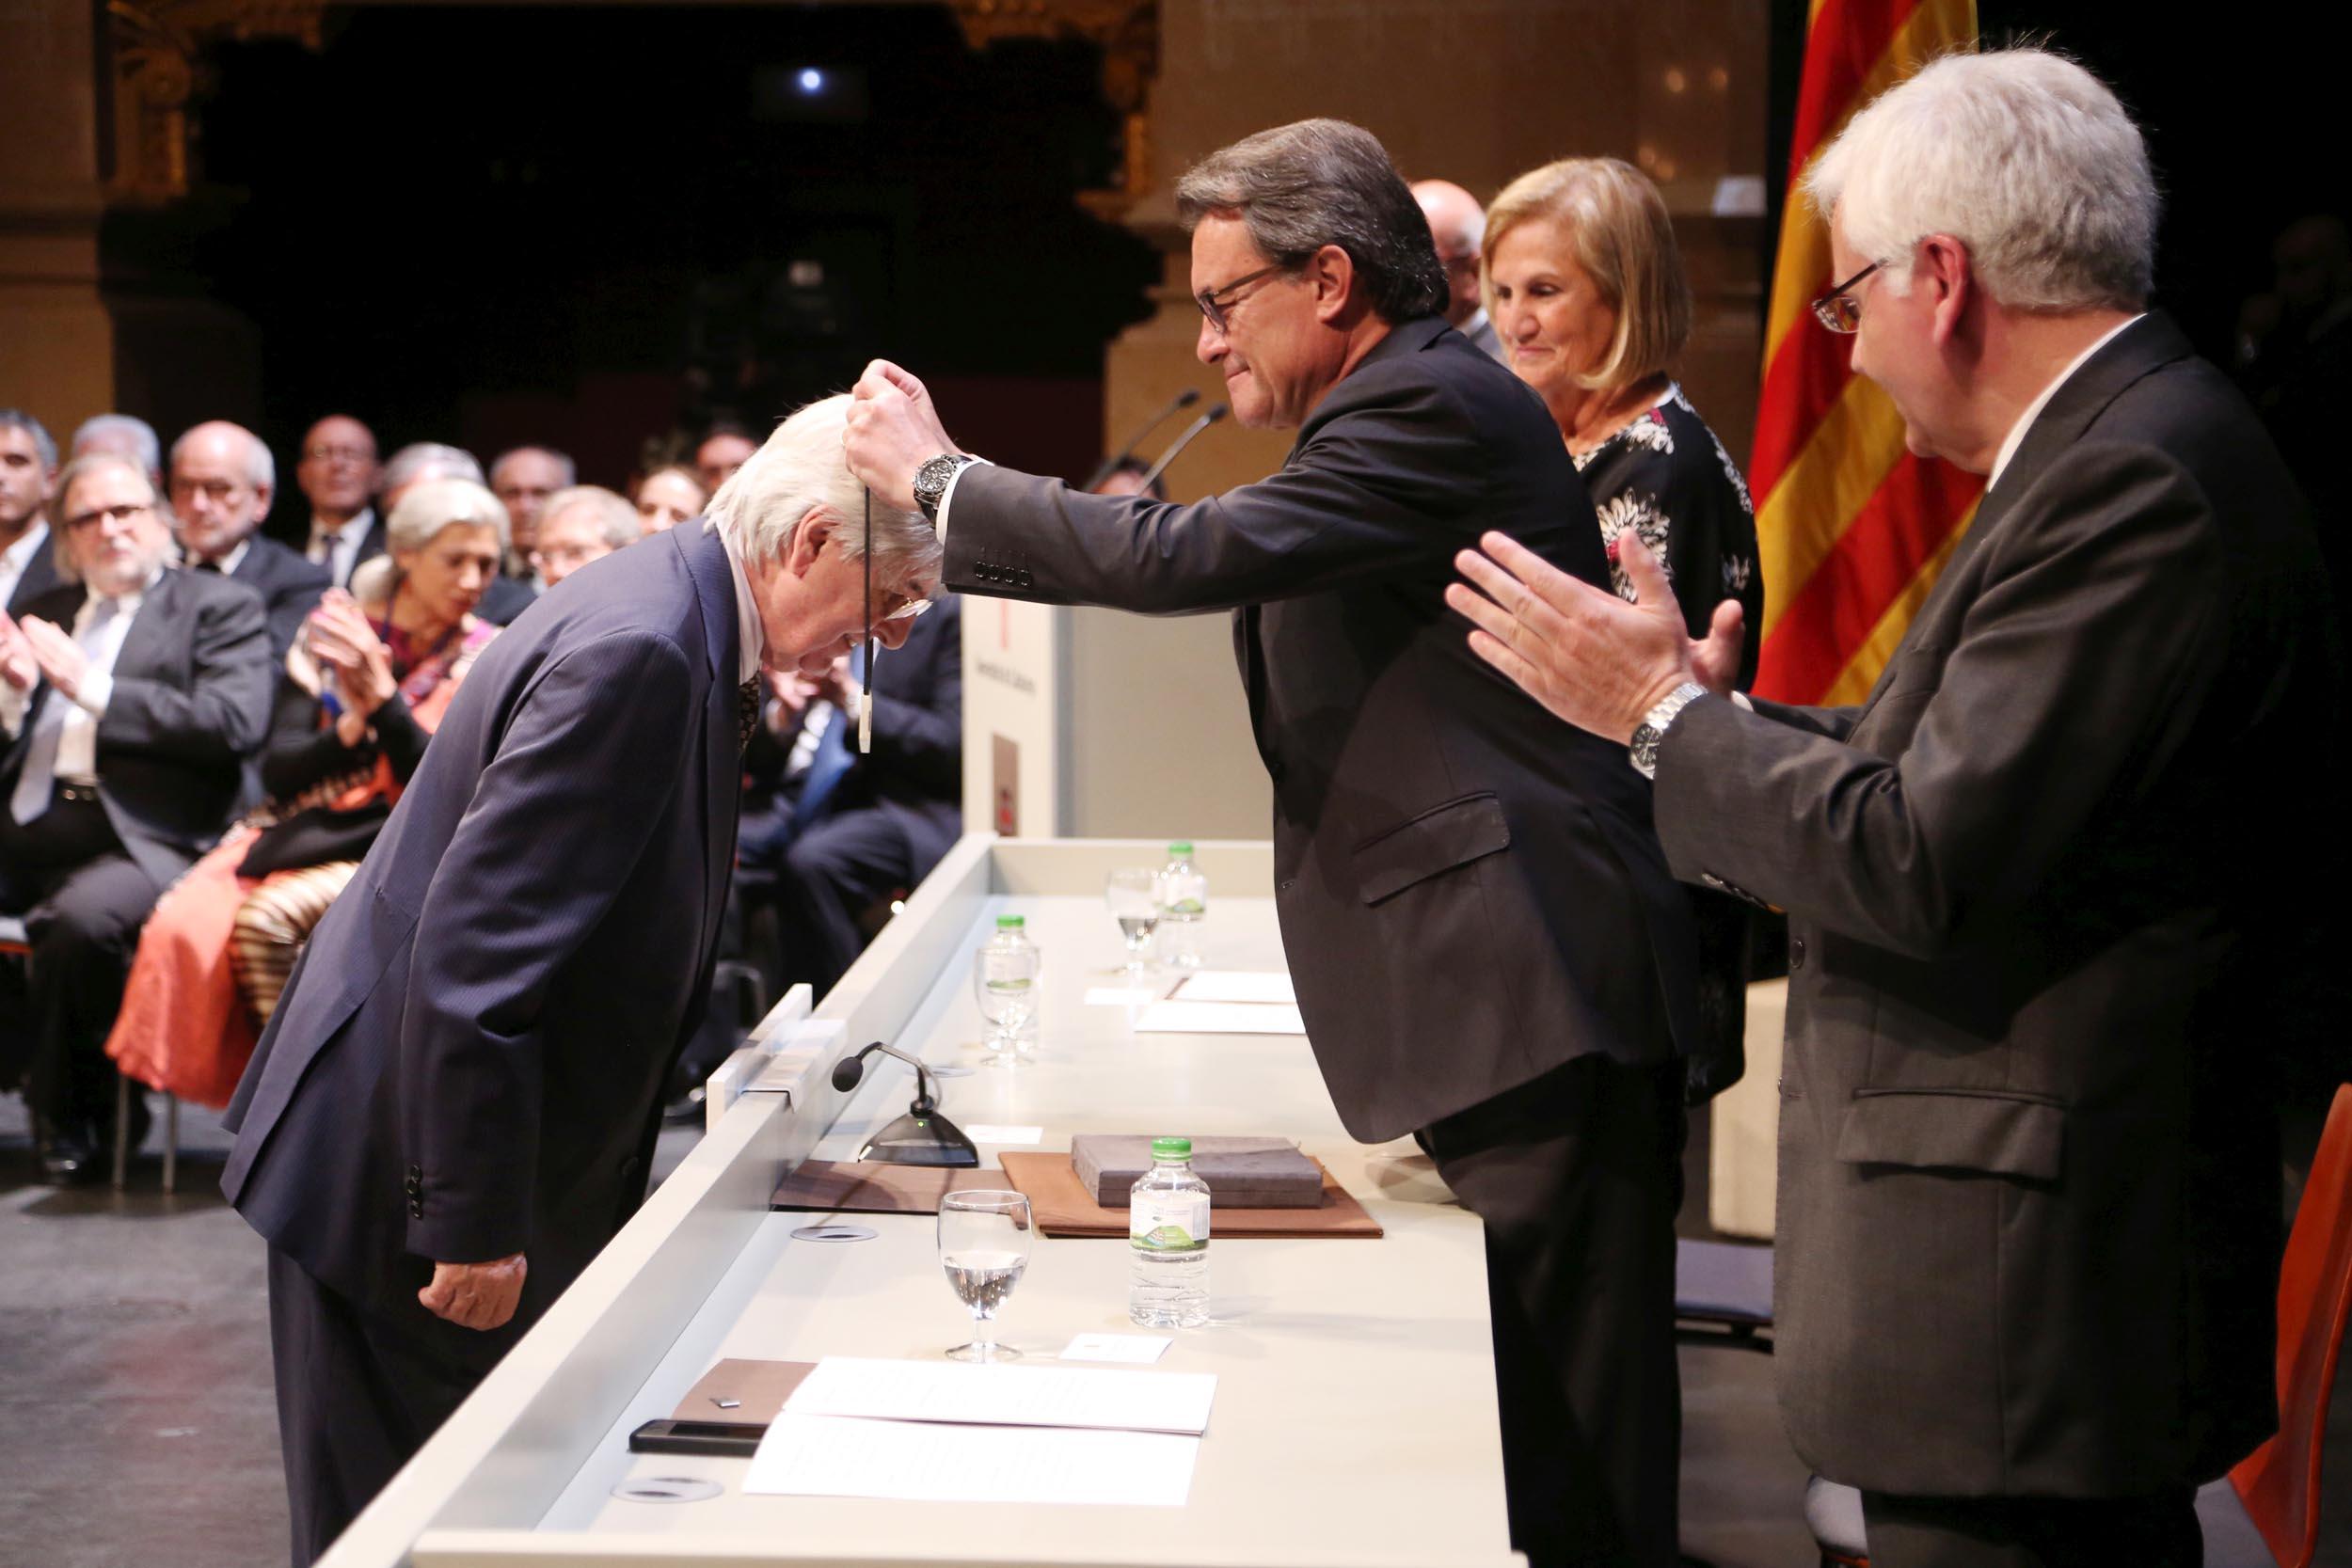 Ramon Coll. Creu Sant JOrdi Generalitat